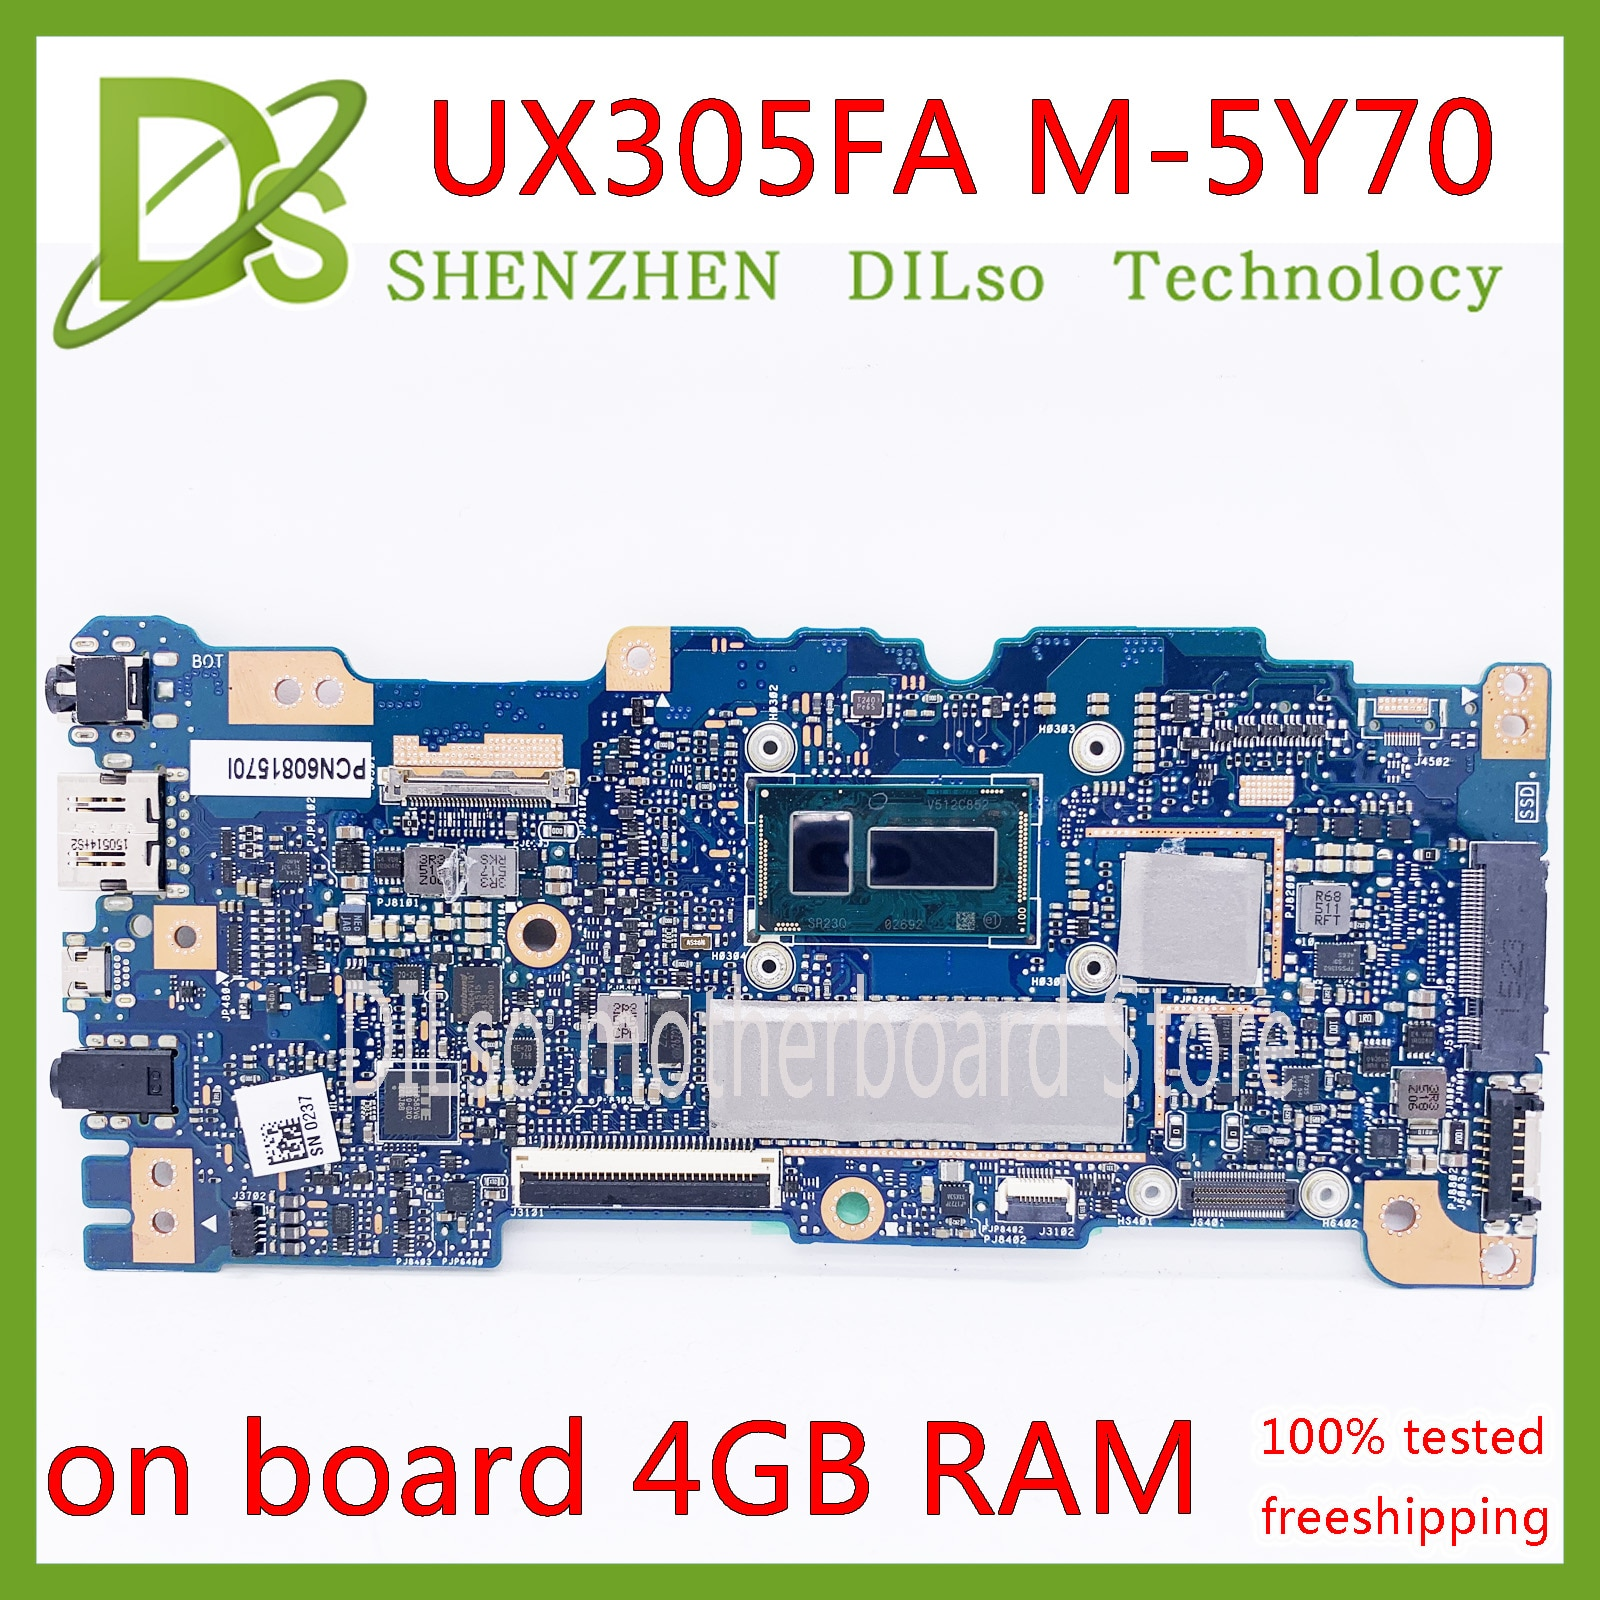 KEFU UX305FA اللوحة ل ASUS UX305FA UX305 UX305F اللوحة المحمول الأصلي دفتر 4G مومري 5Y70 CPU 100% اختبار